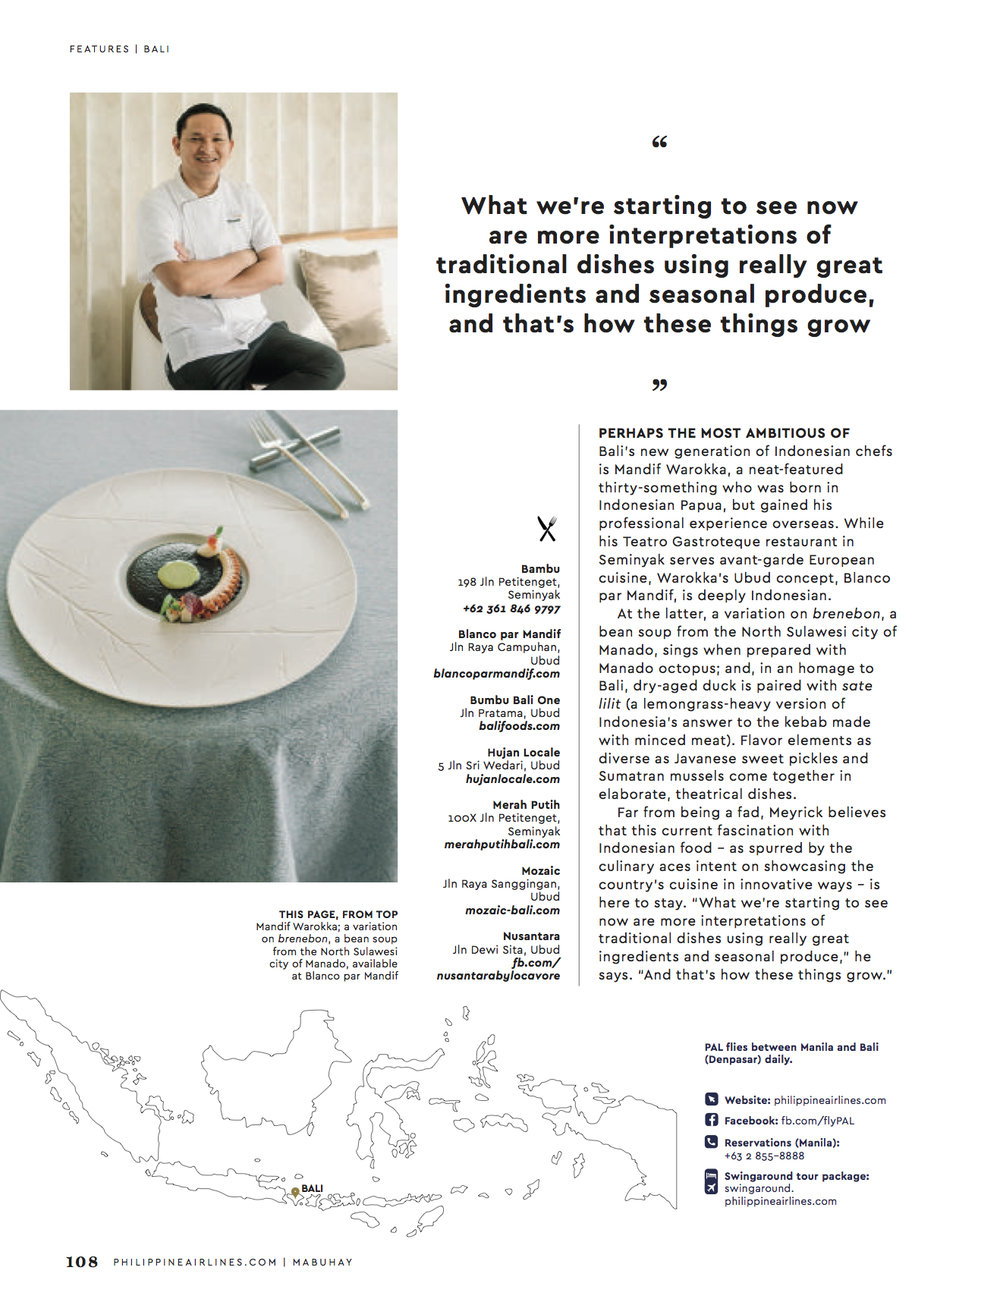 Mabuhay_201803_Bali_Food_5.jpg